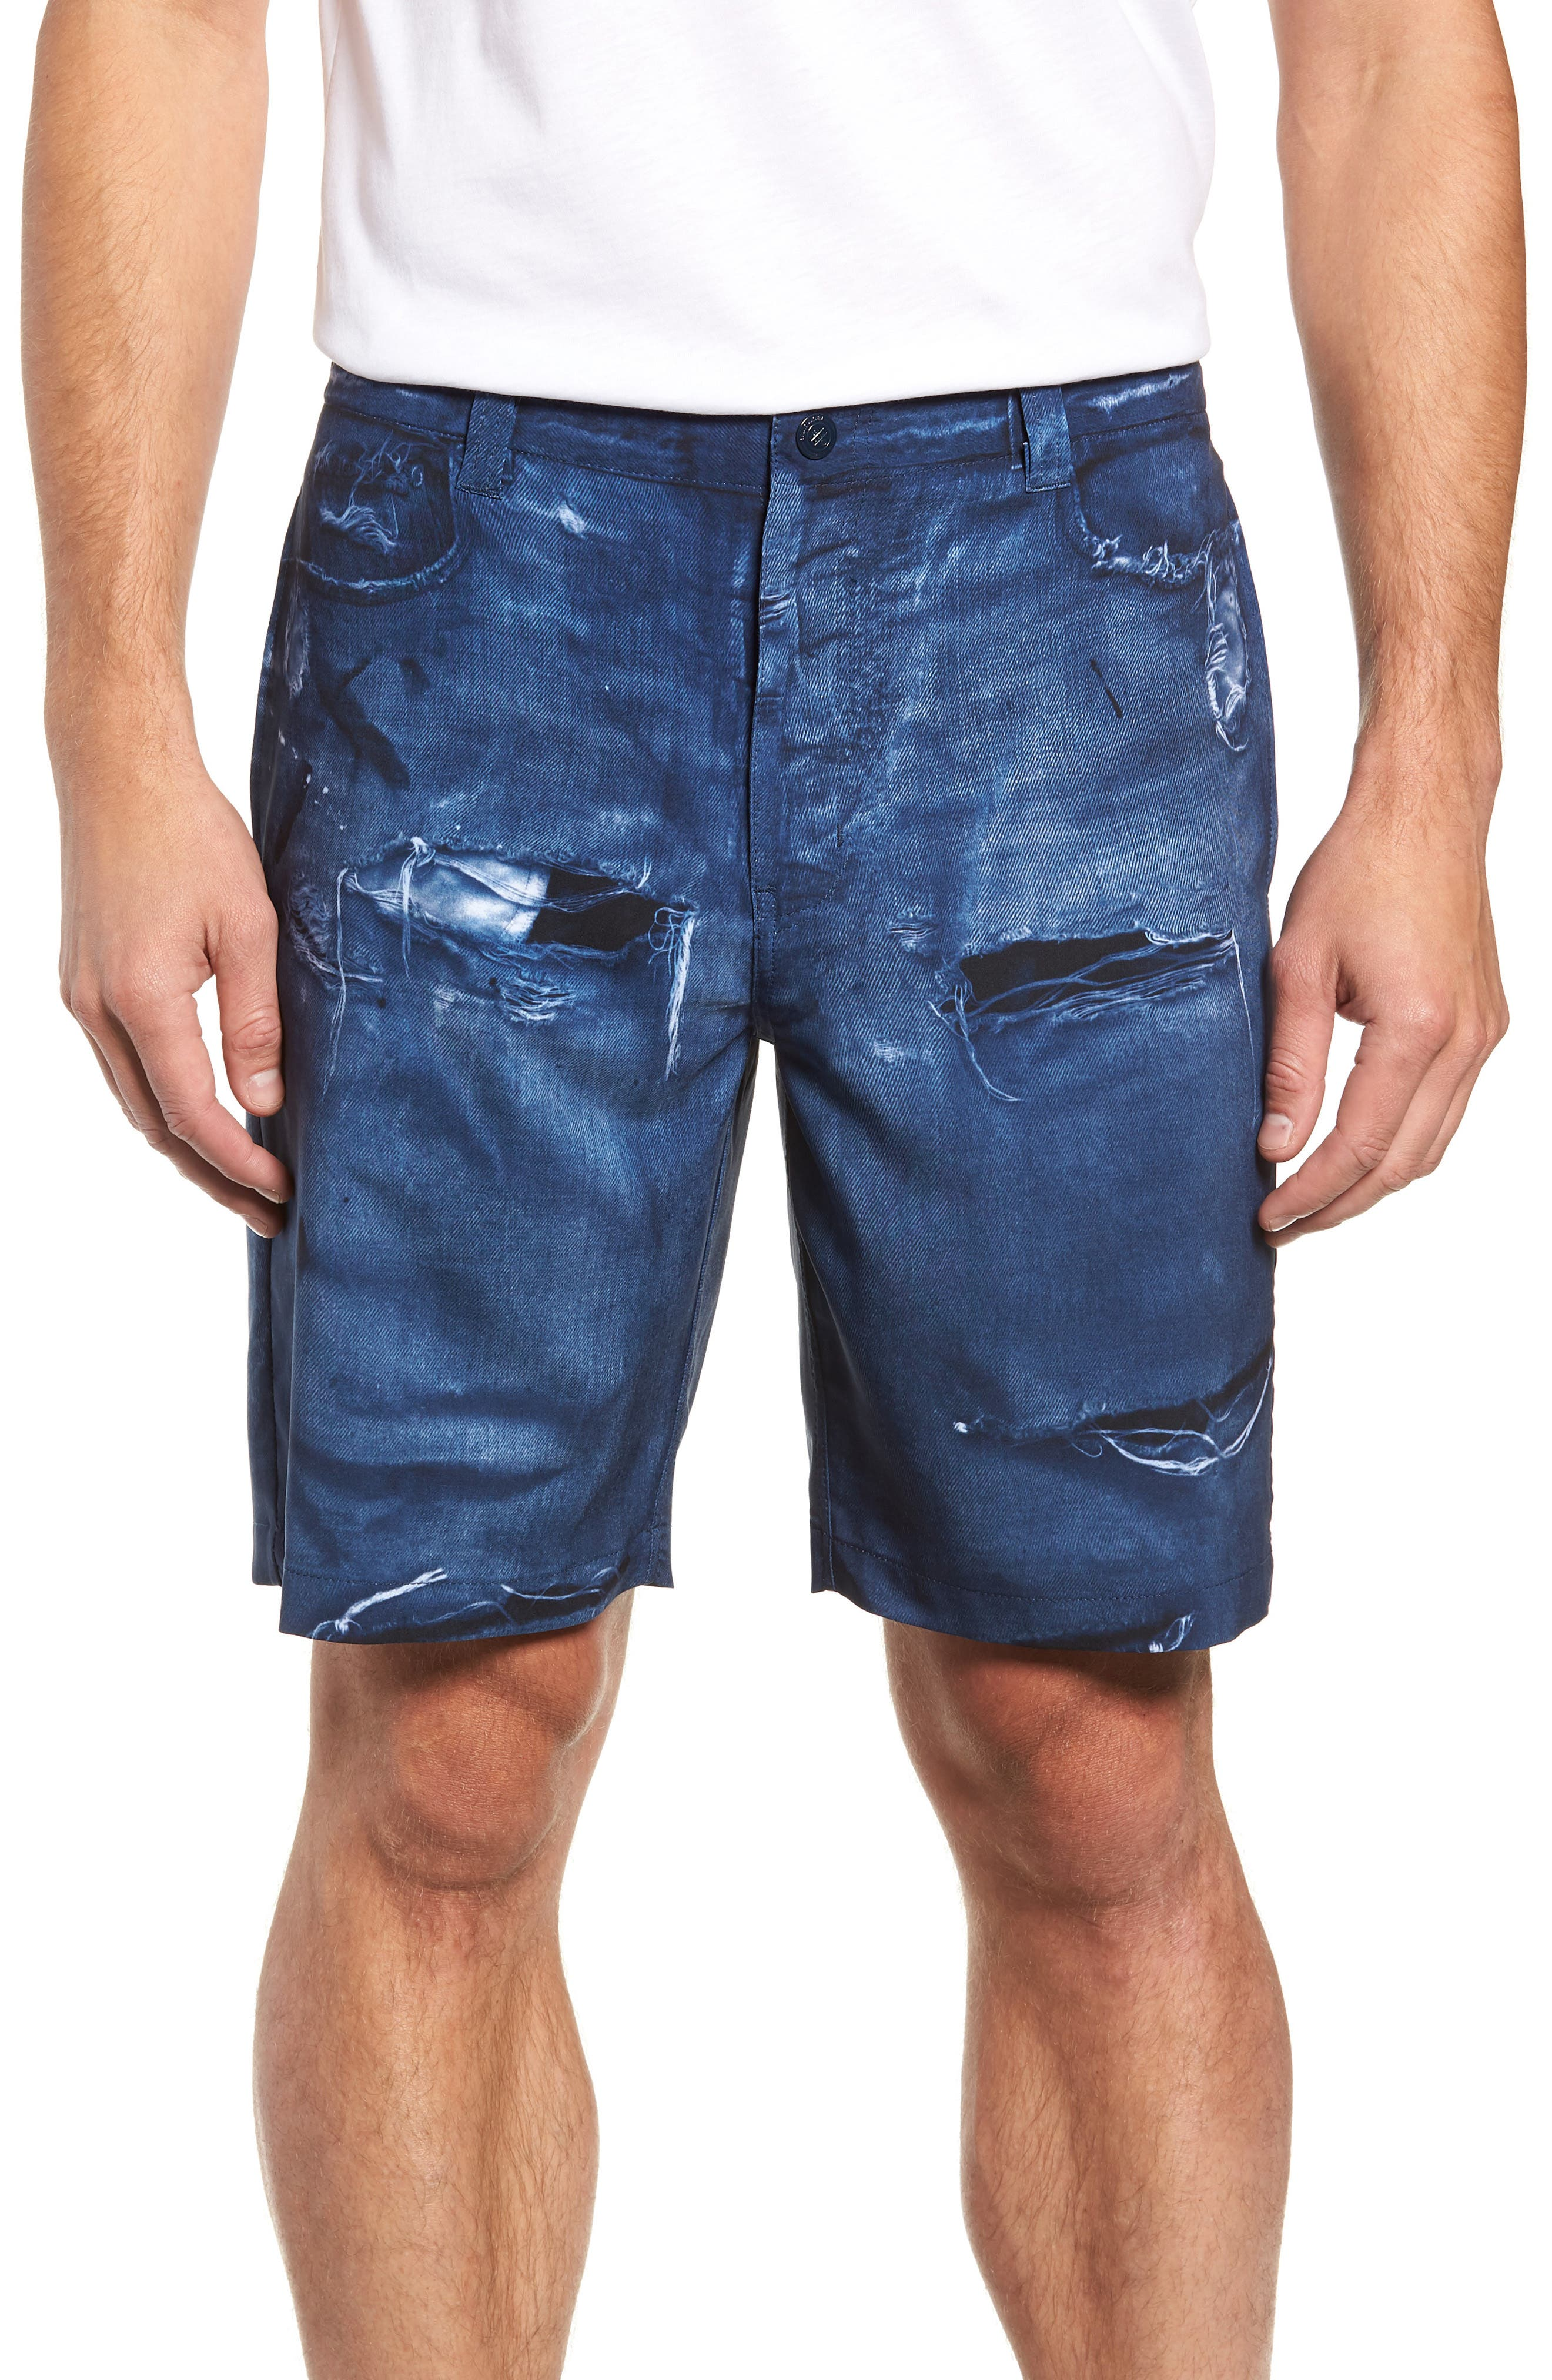 Man o' War Regular Fit Shorts,                         Main,                         color, DENIM